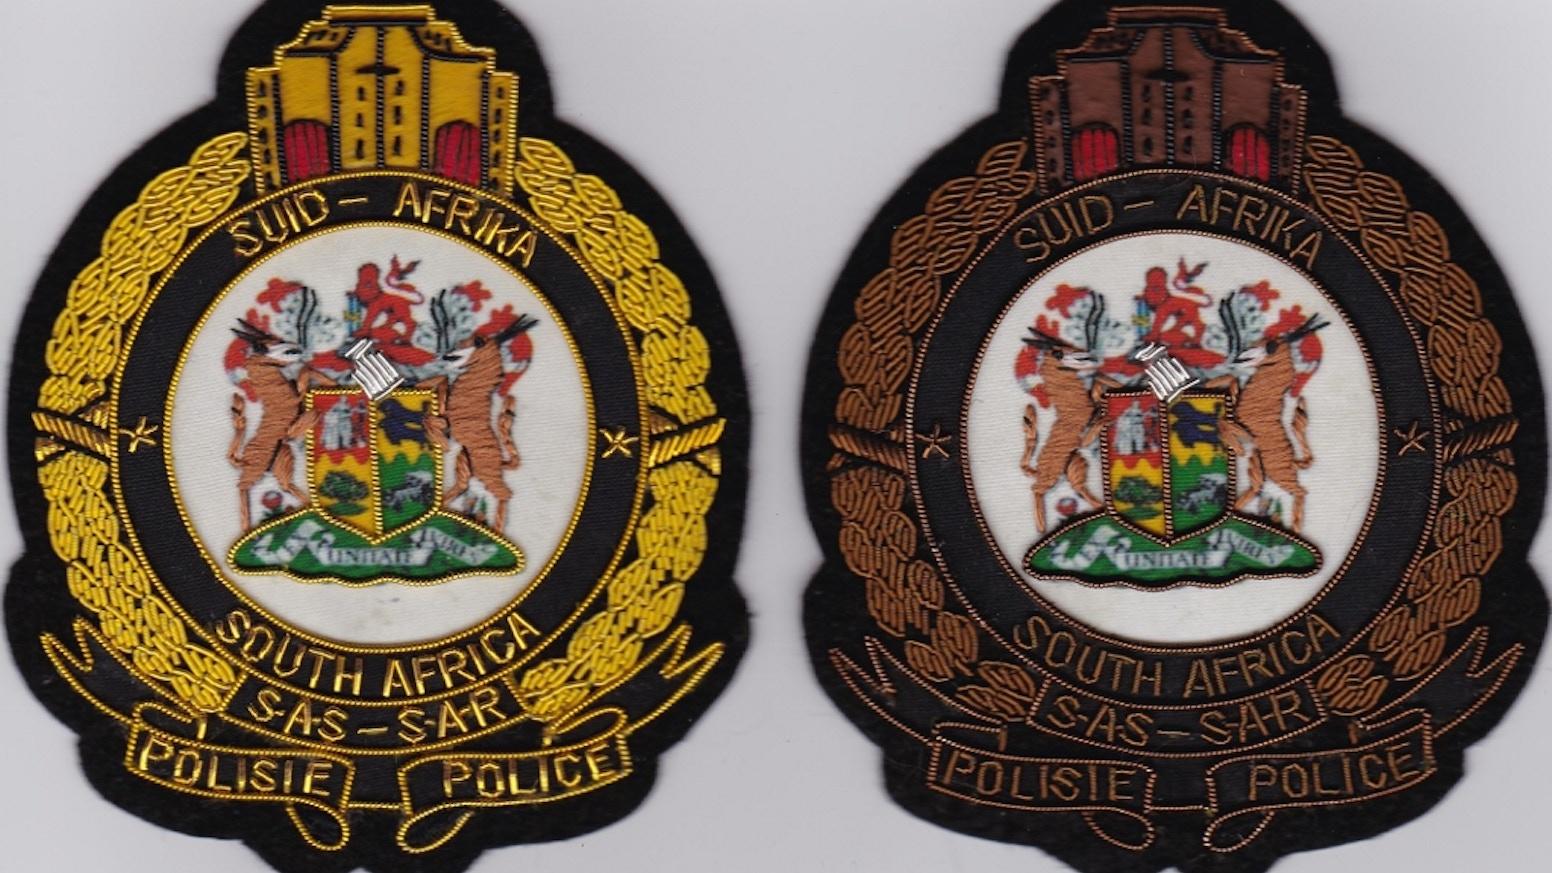 S A R P Bullion Blazer Badges & Memorabilia by Frans J